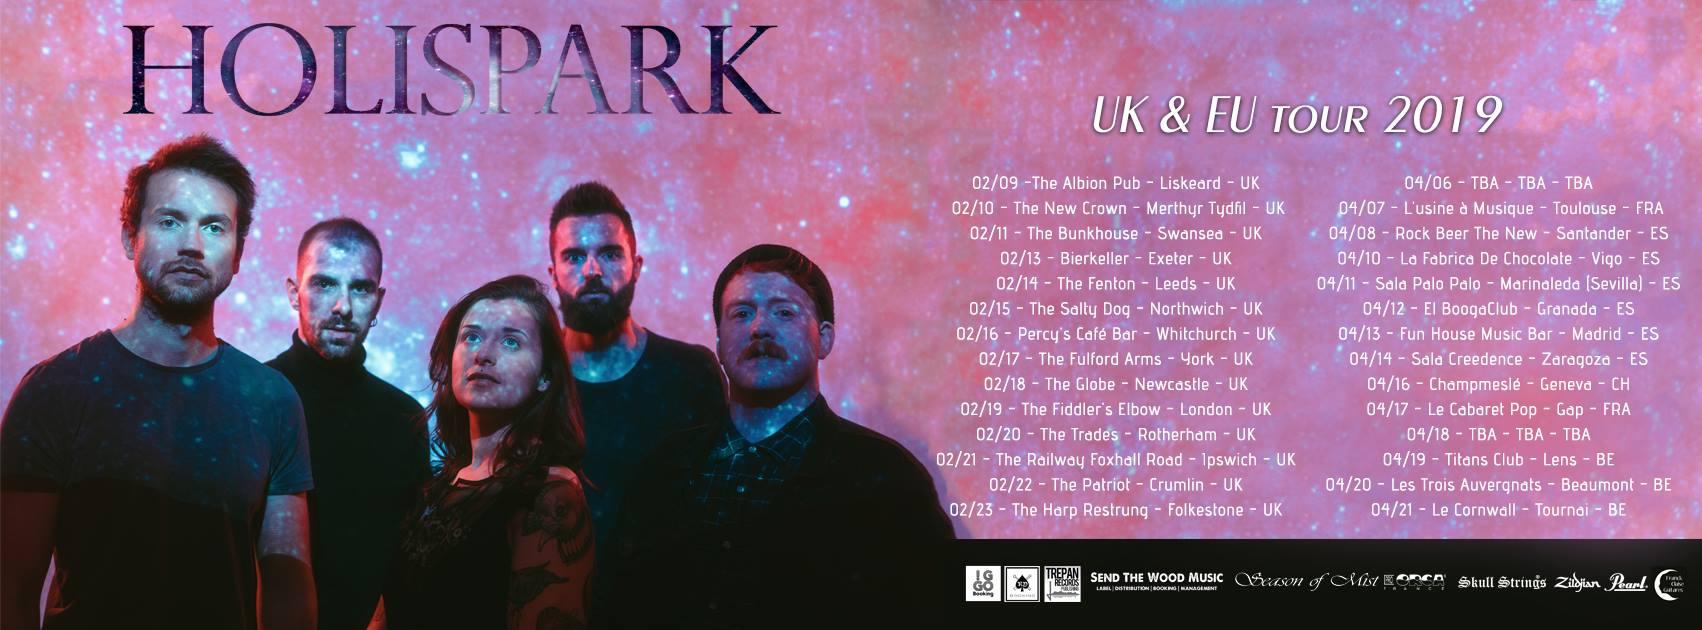 Holispark - Tour Dates